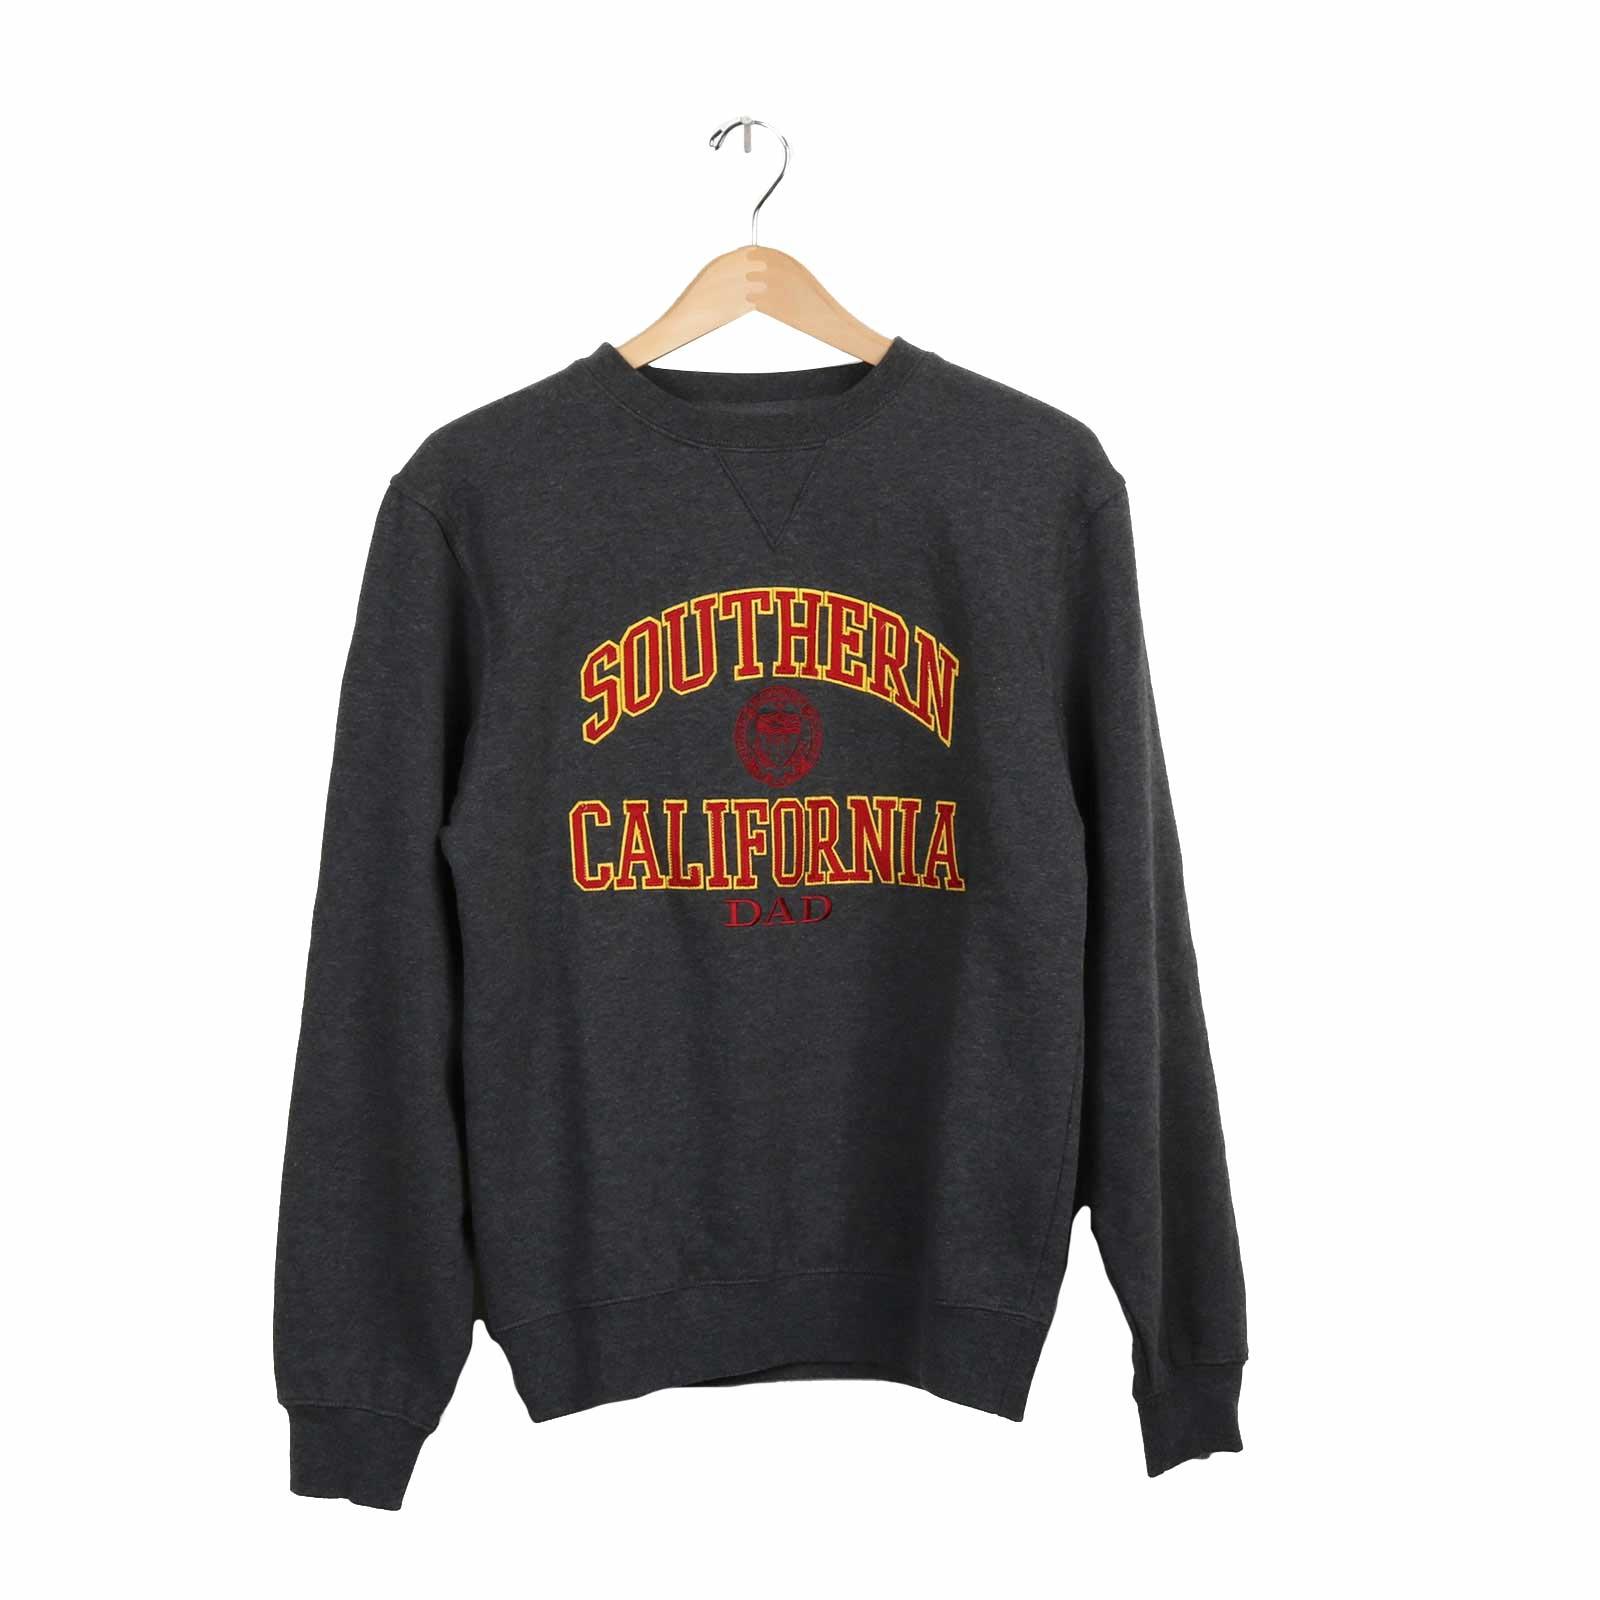 Usc So Cal Shield Dad Crew Sweatshirt